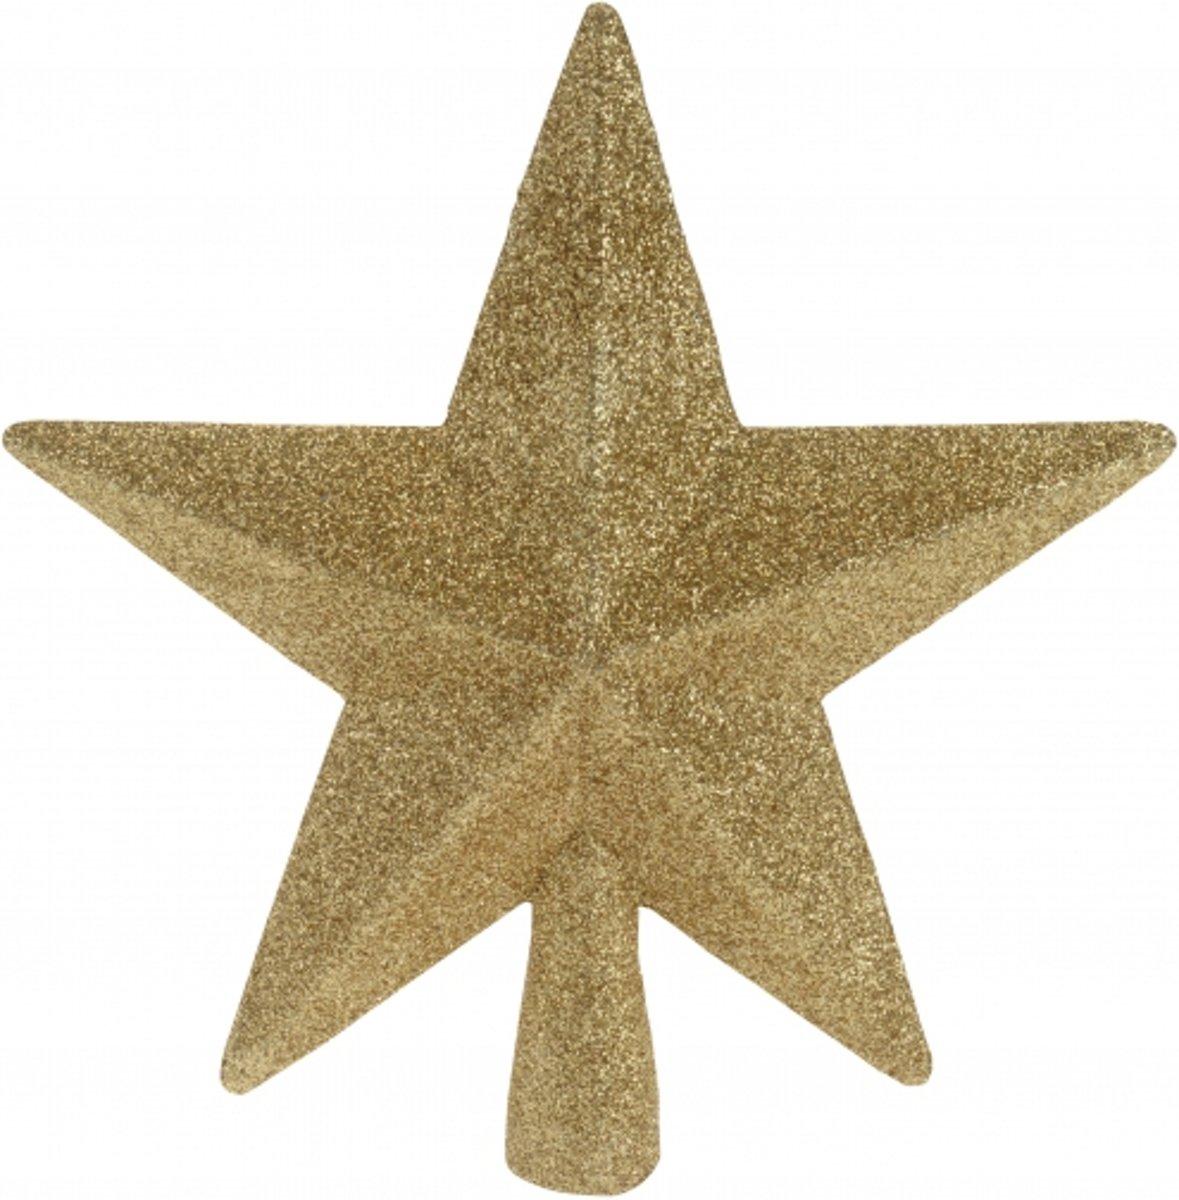 Piek ster goud met glitters 19 cm kopen